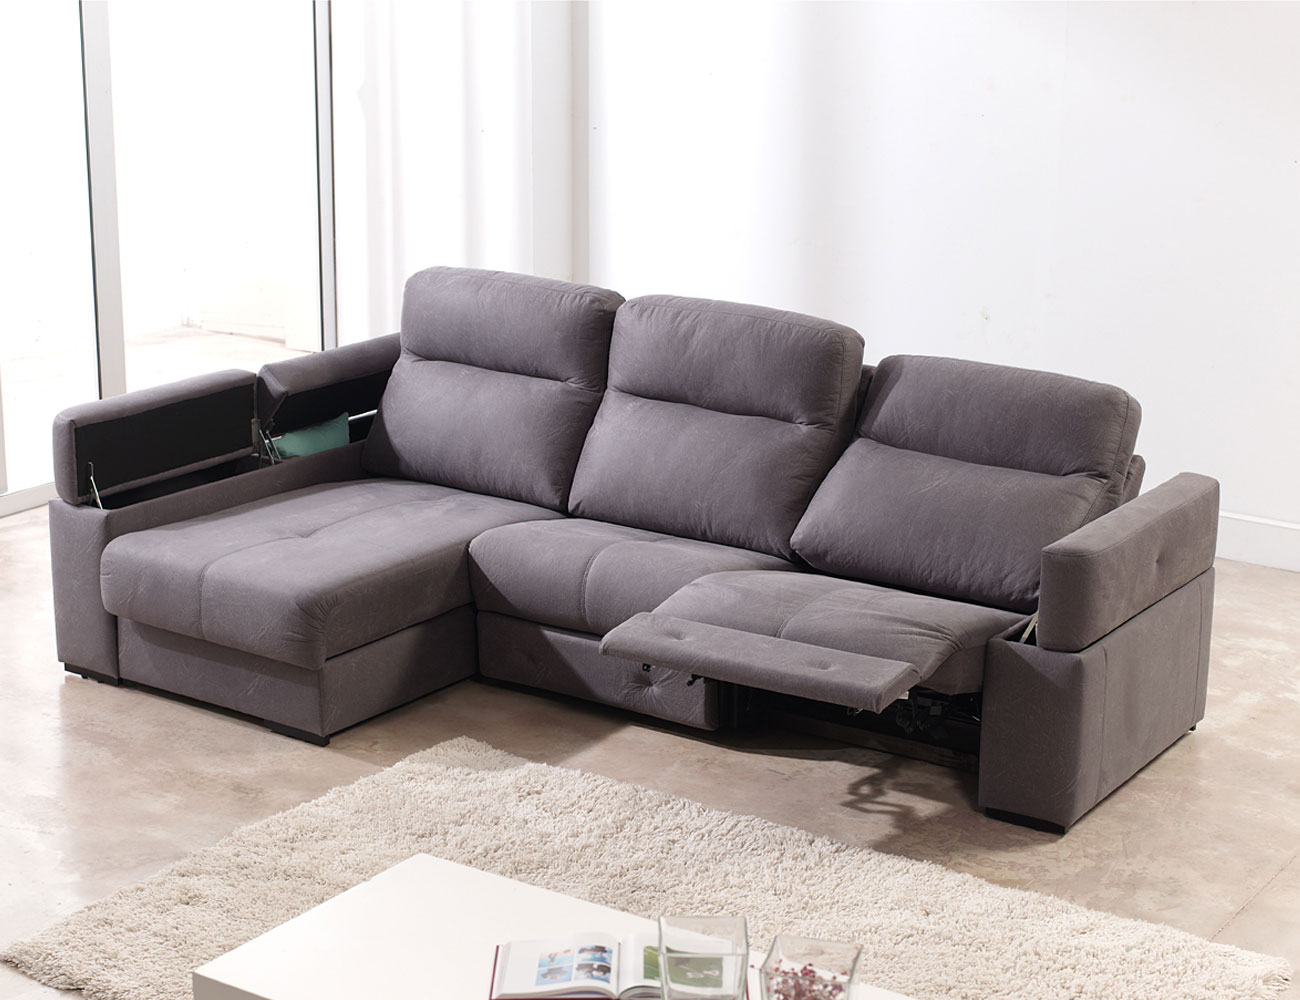 Sofa chaiselongue relax motor electrico 3 arcon 112